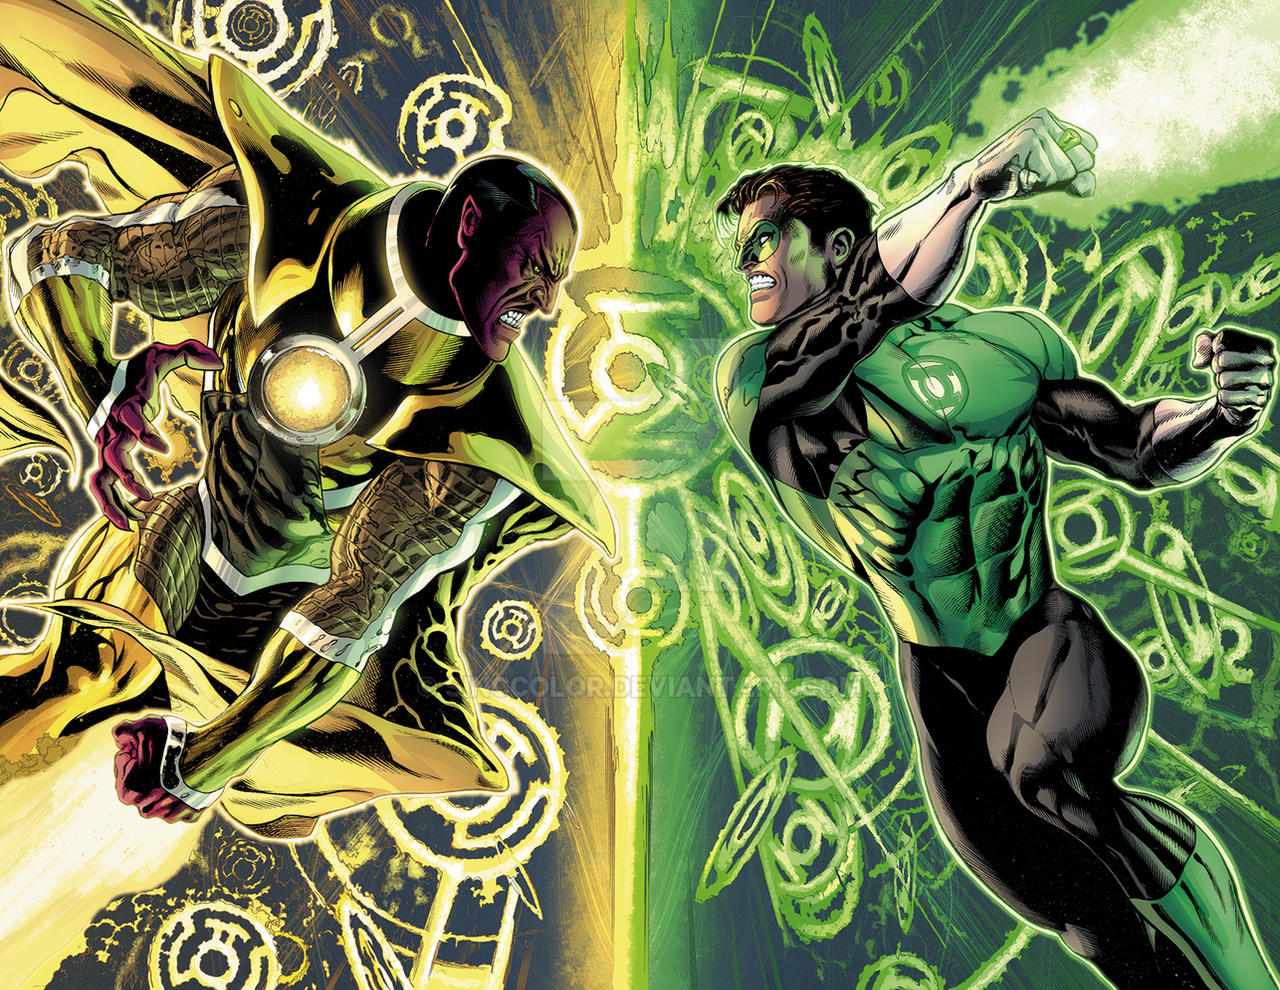 Green Lantern #20, pgs 42-43 by sinccolor